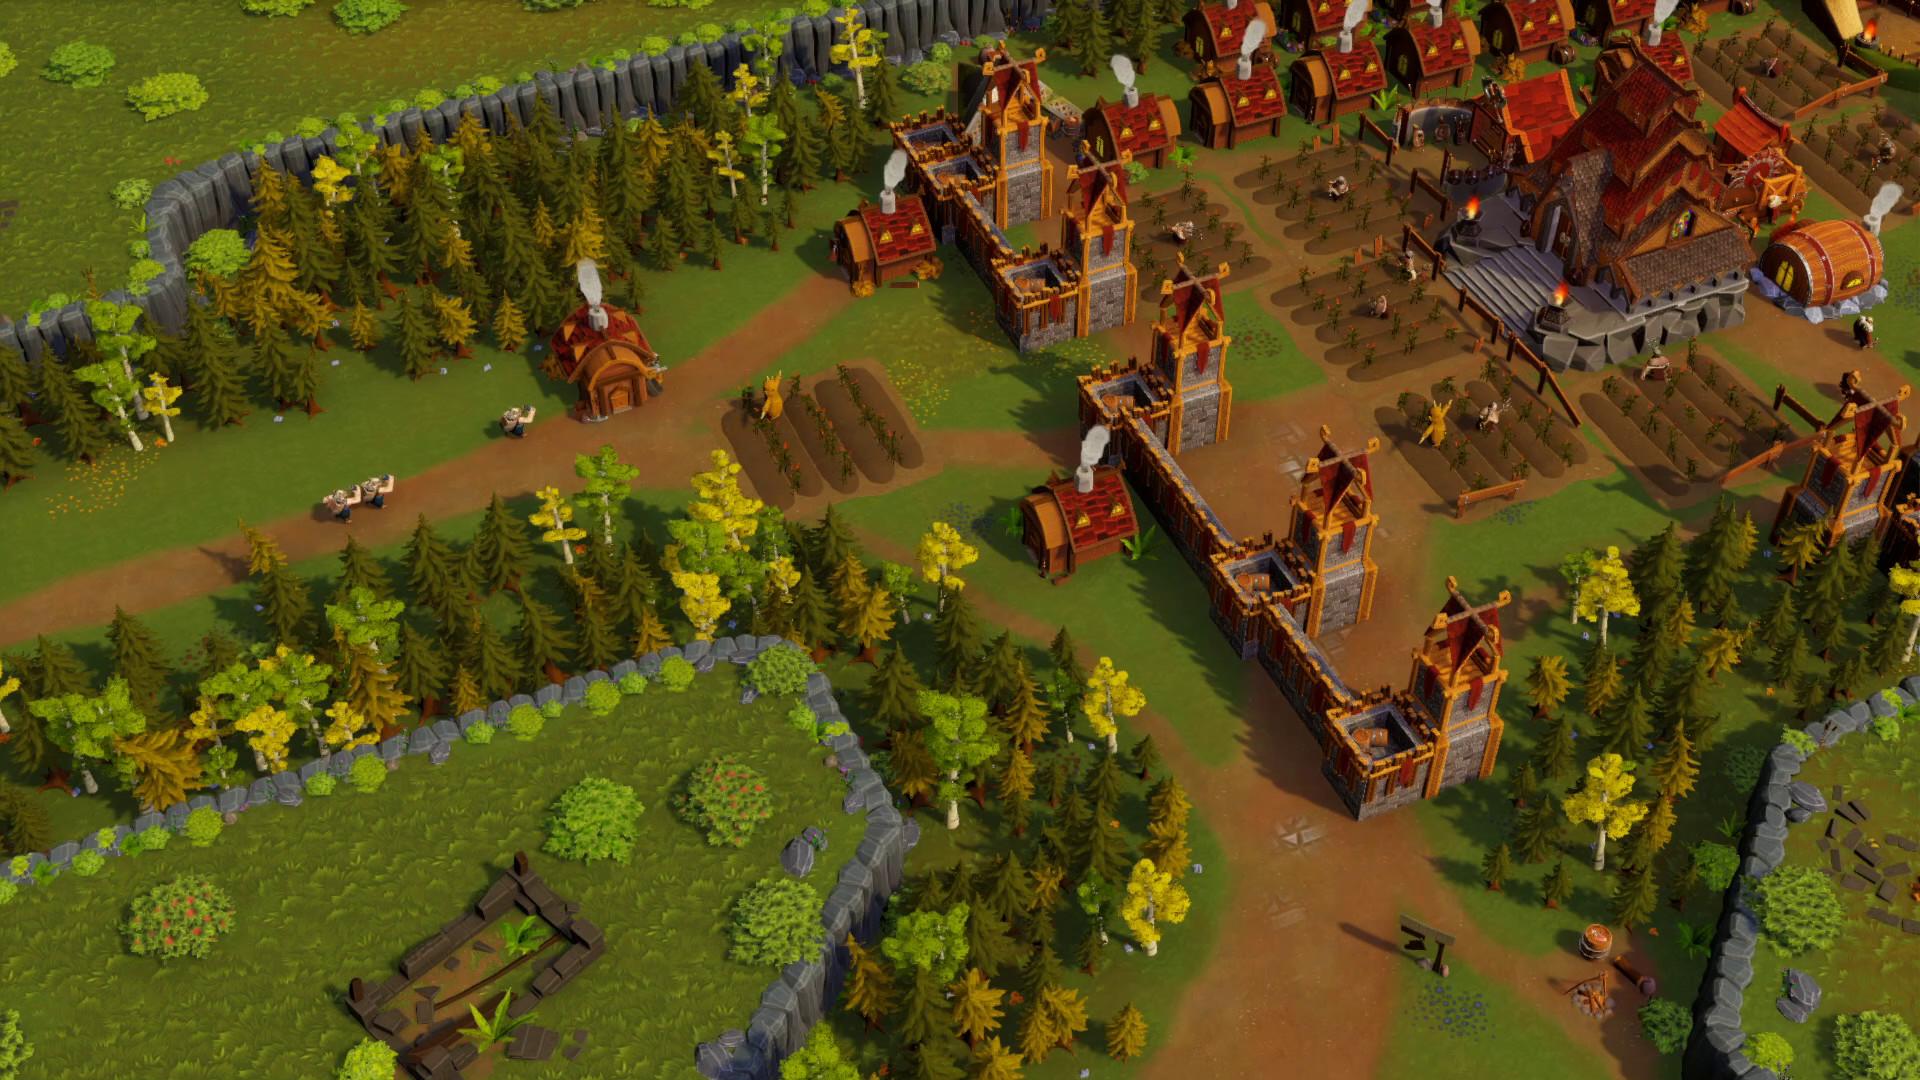 DwarfHeim will head into Steam Early Access this fall